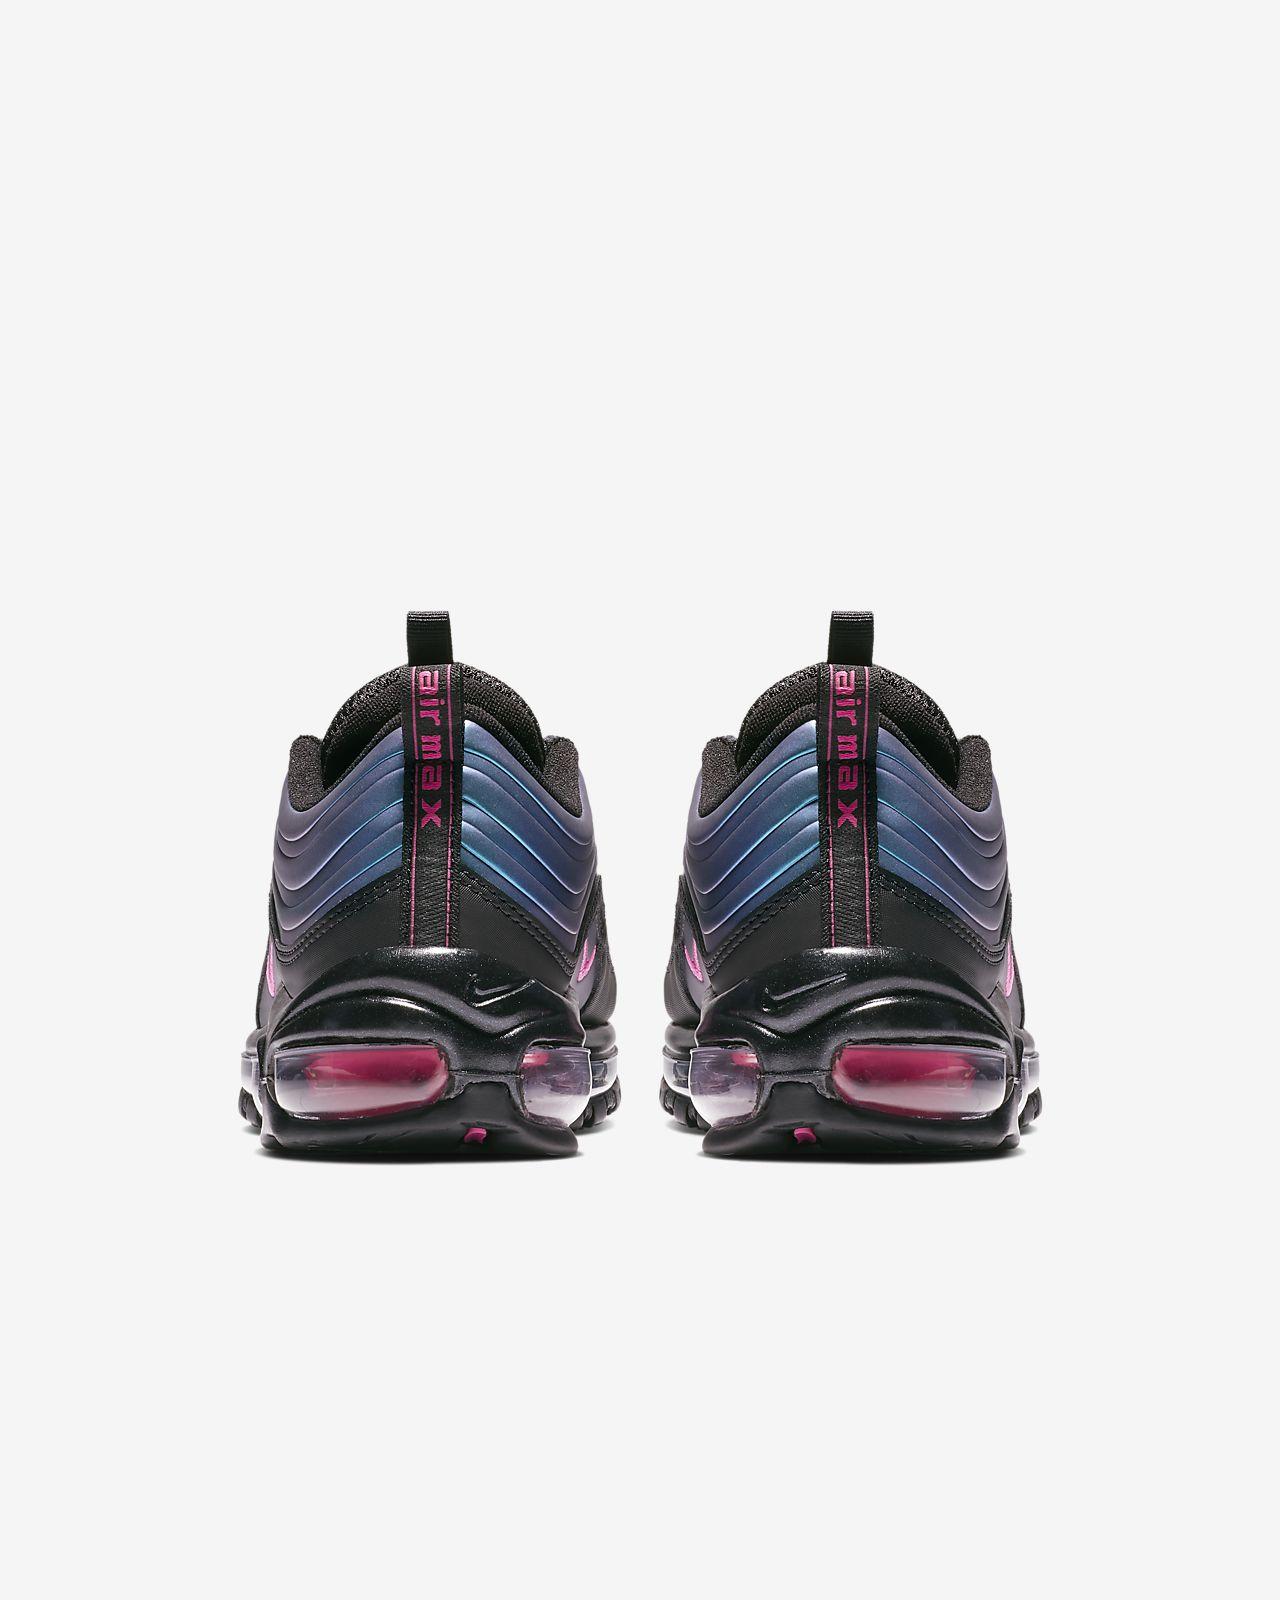 1ae6e0bd137a Nike Air Max 97 RF Women s Shoe. Nike.com IE